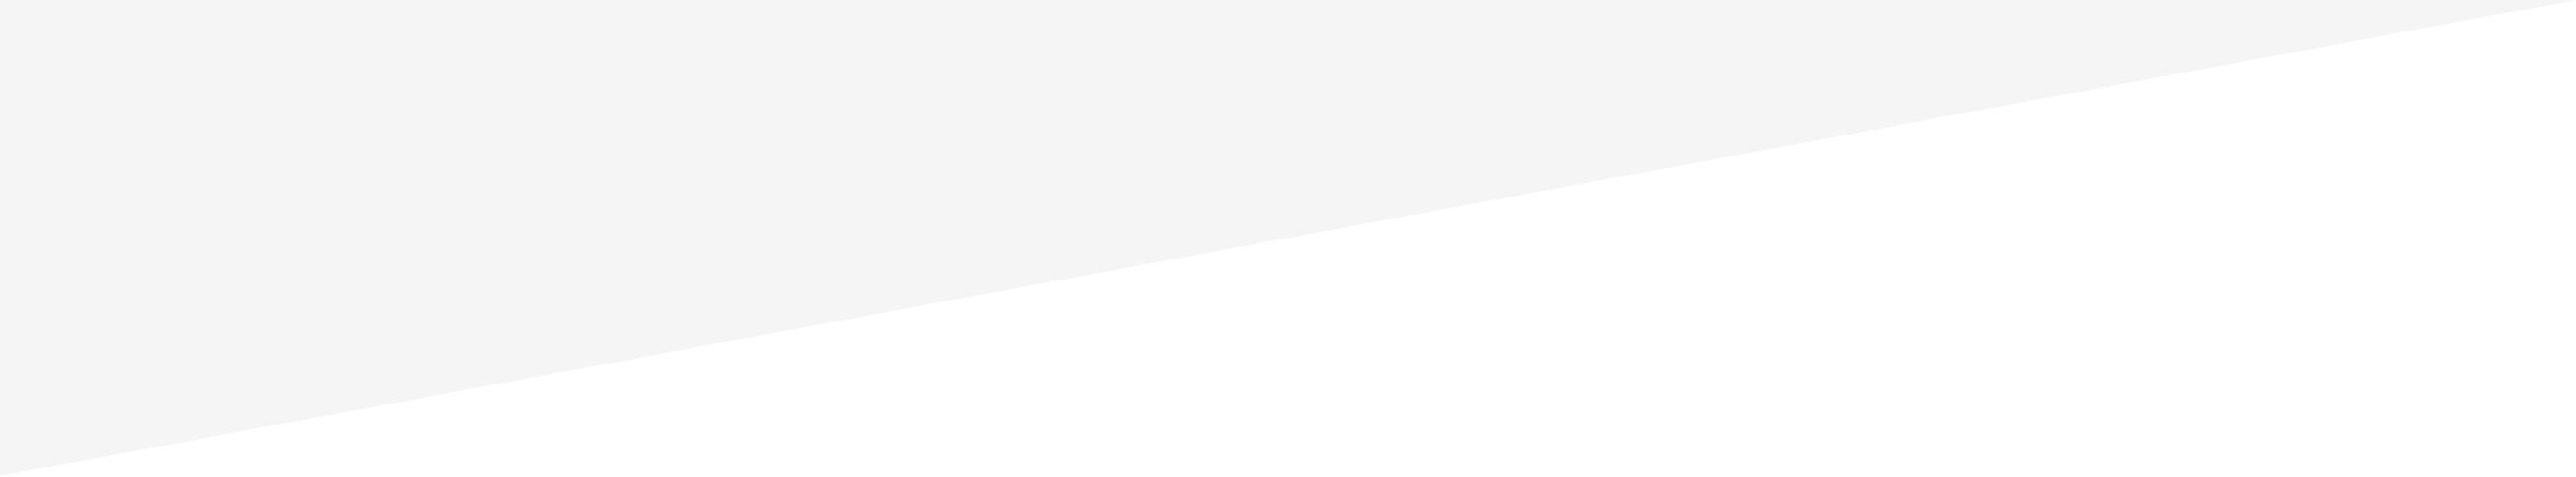 cognidox-background-grey-bottom-banner.png